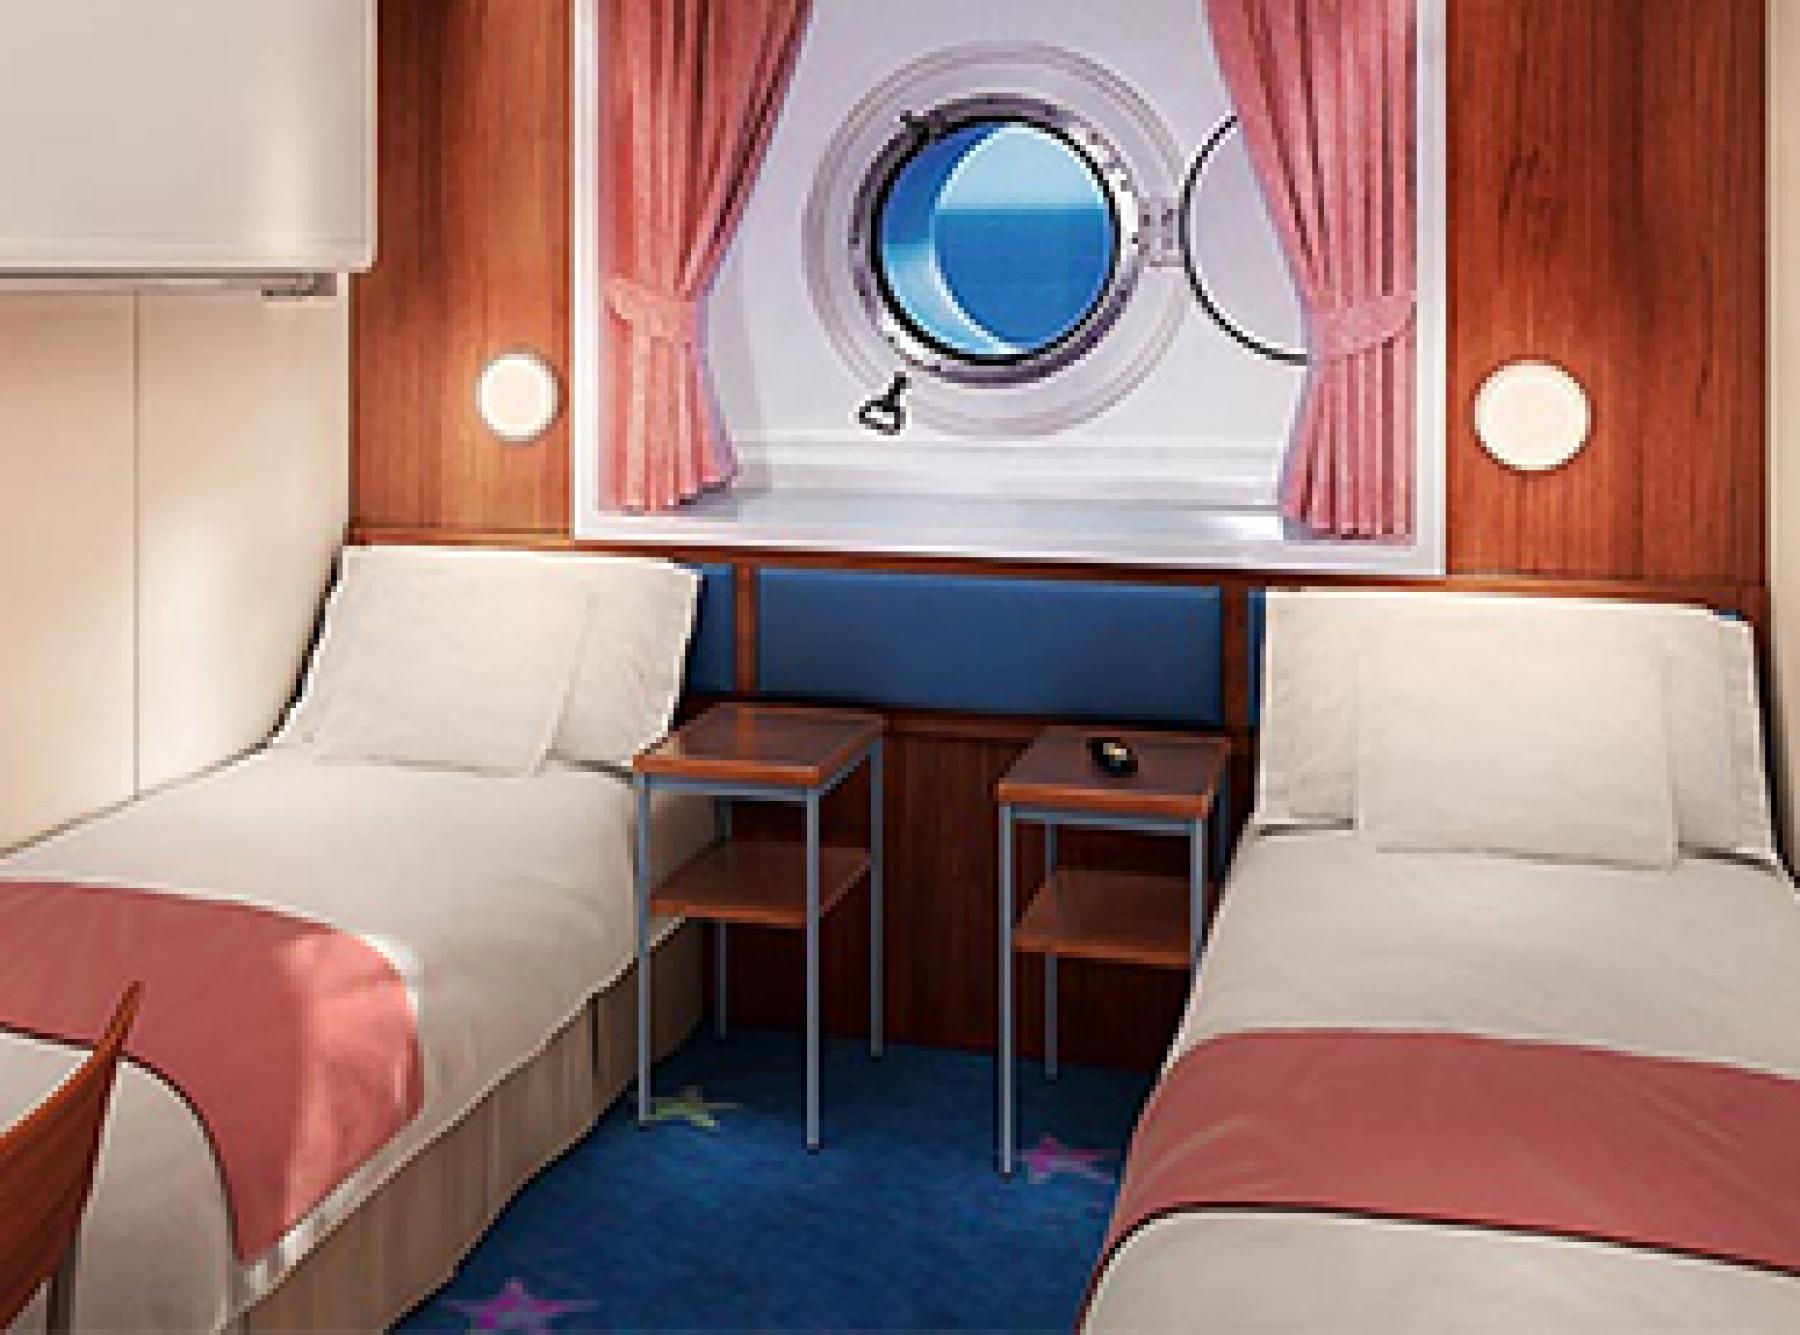 Norwegian Cruise Line Norwegian Dawn Accommodation Porthole Window.jpg